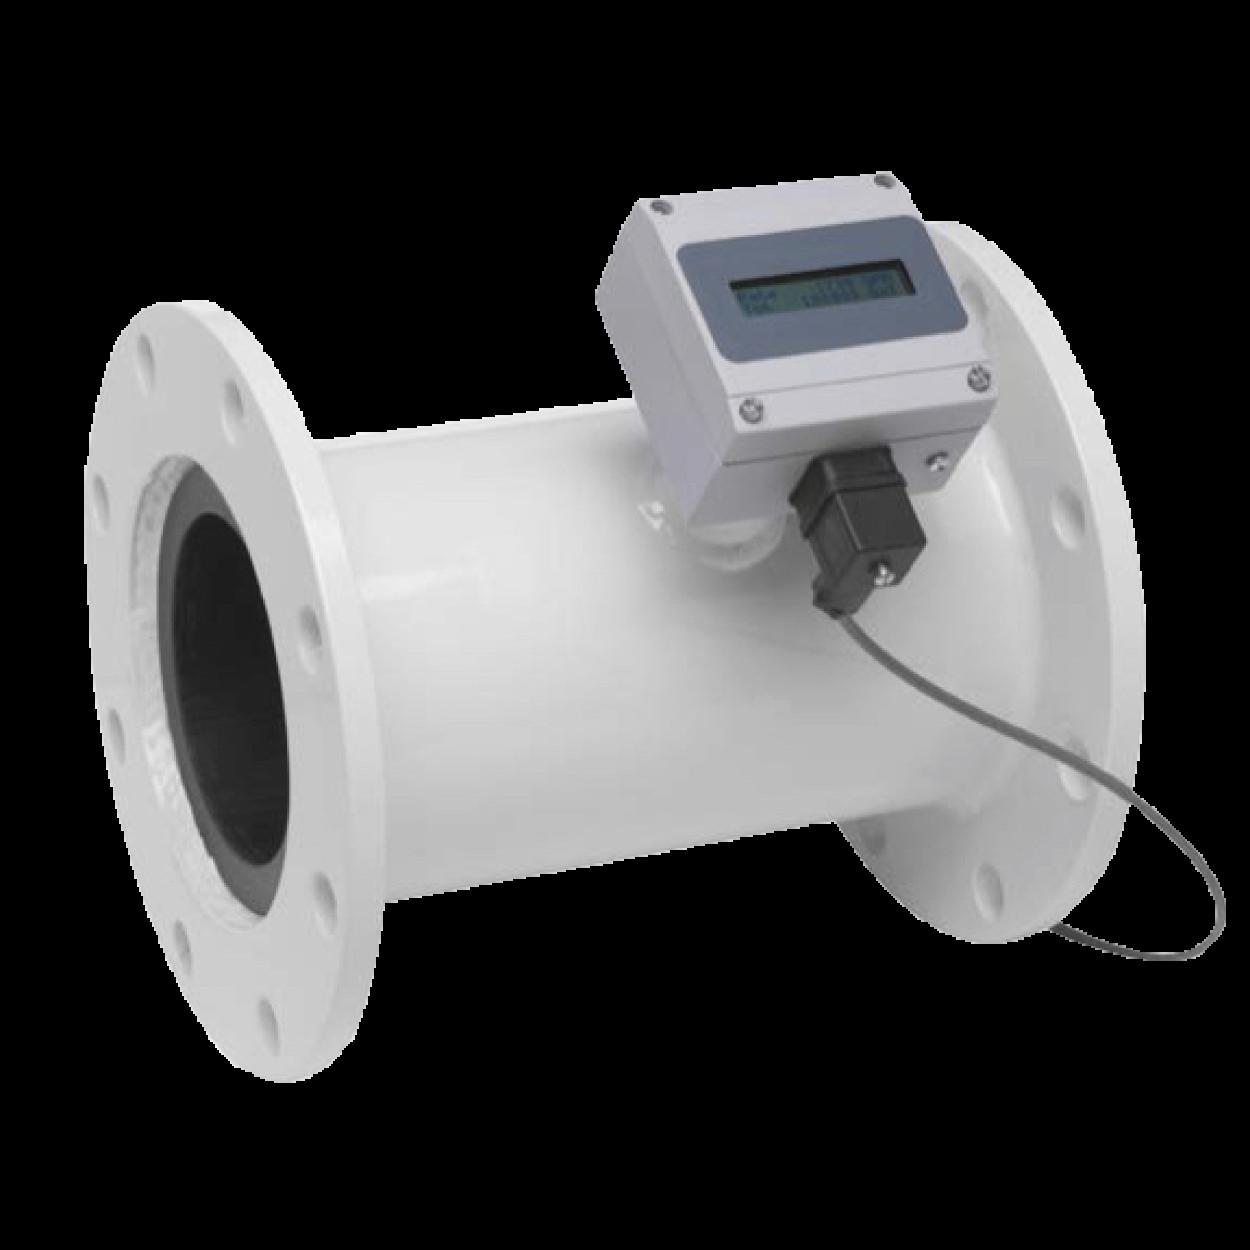 FL520_electromagnetic_flow_meter